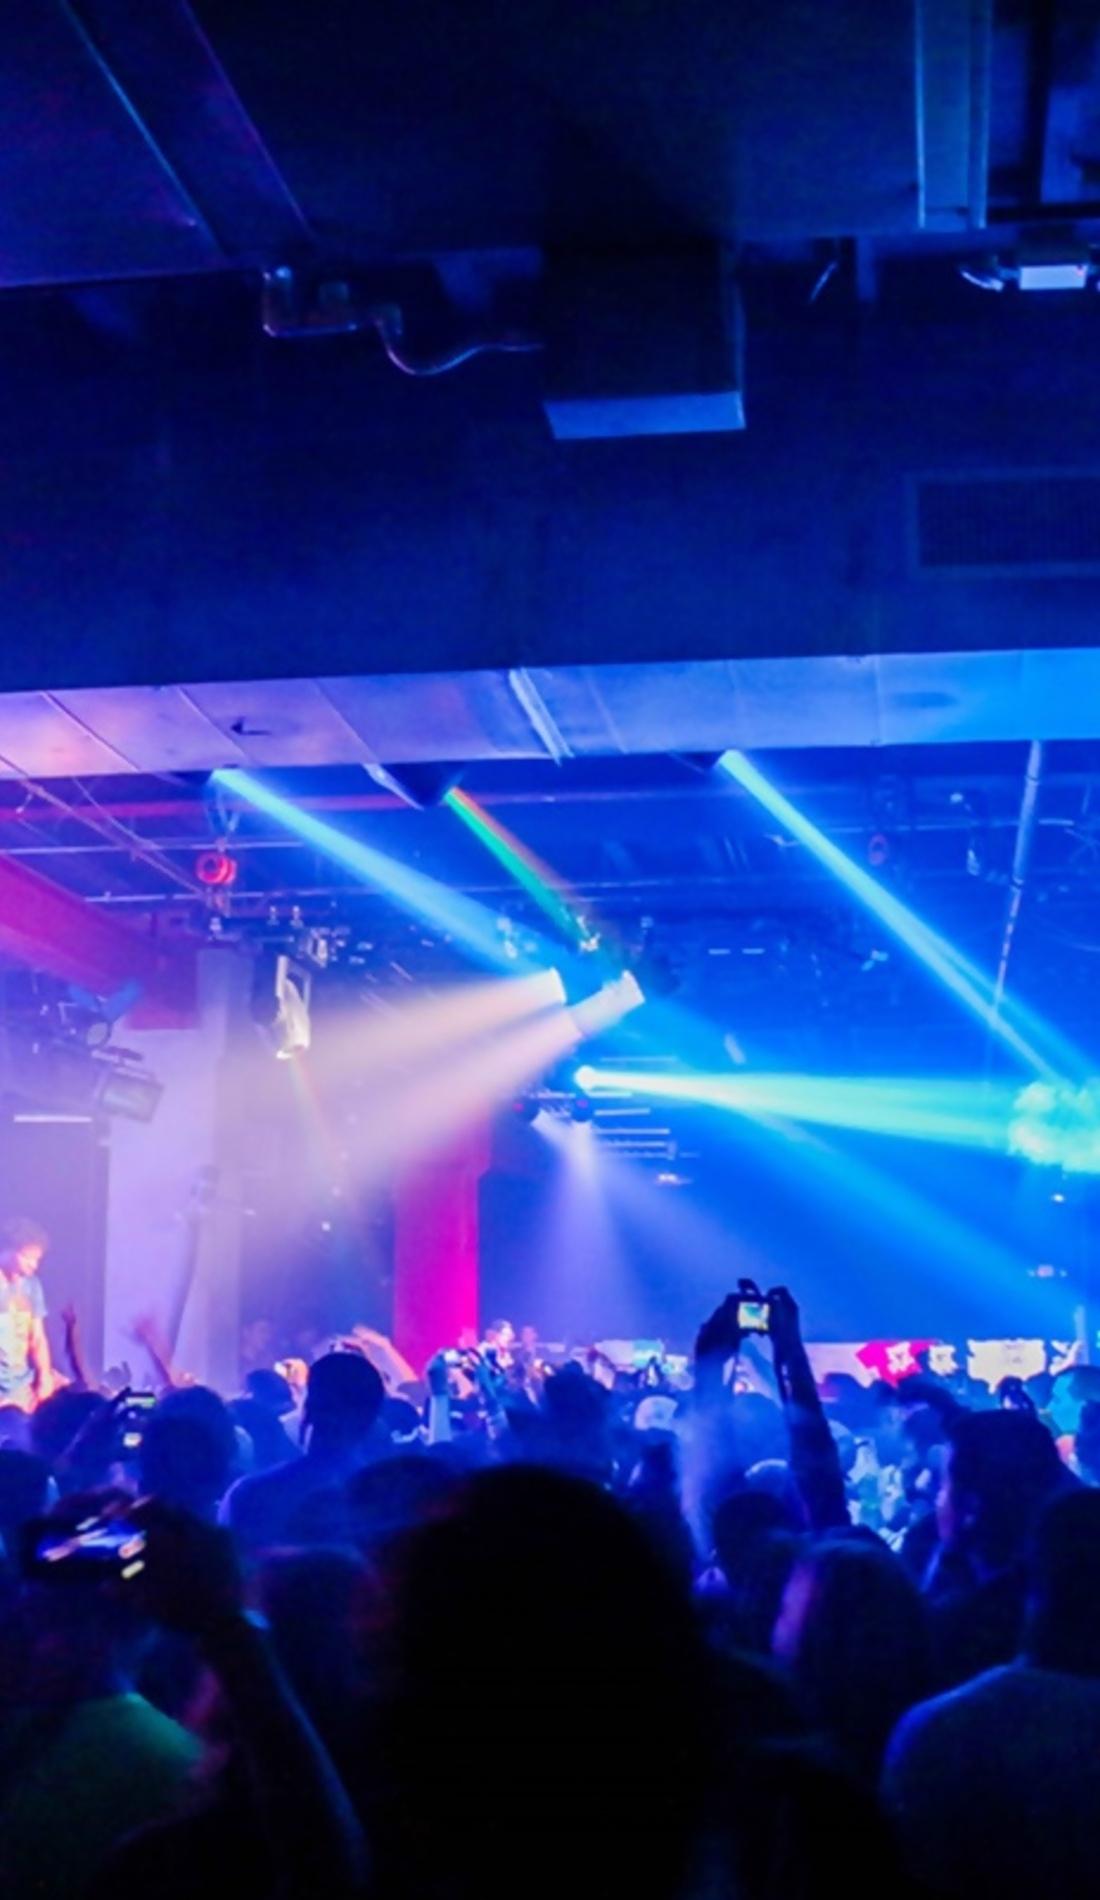 A The Smokers Club Tour live event